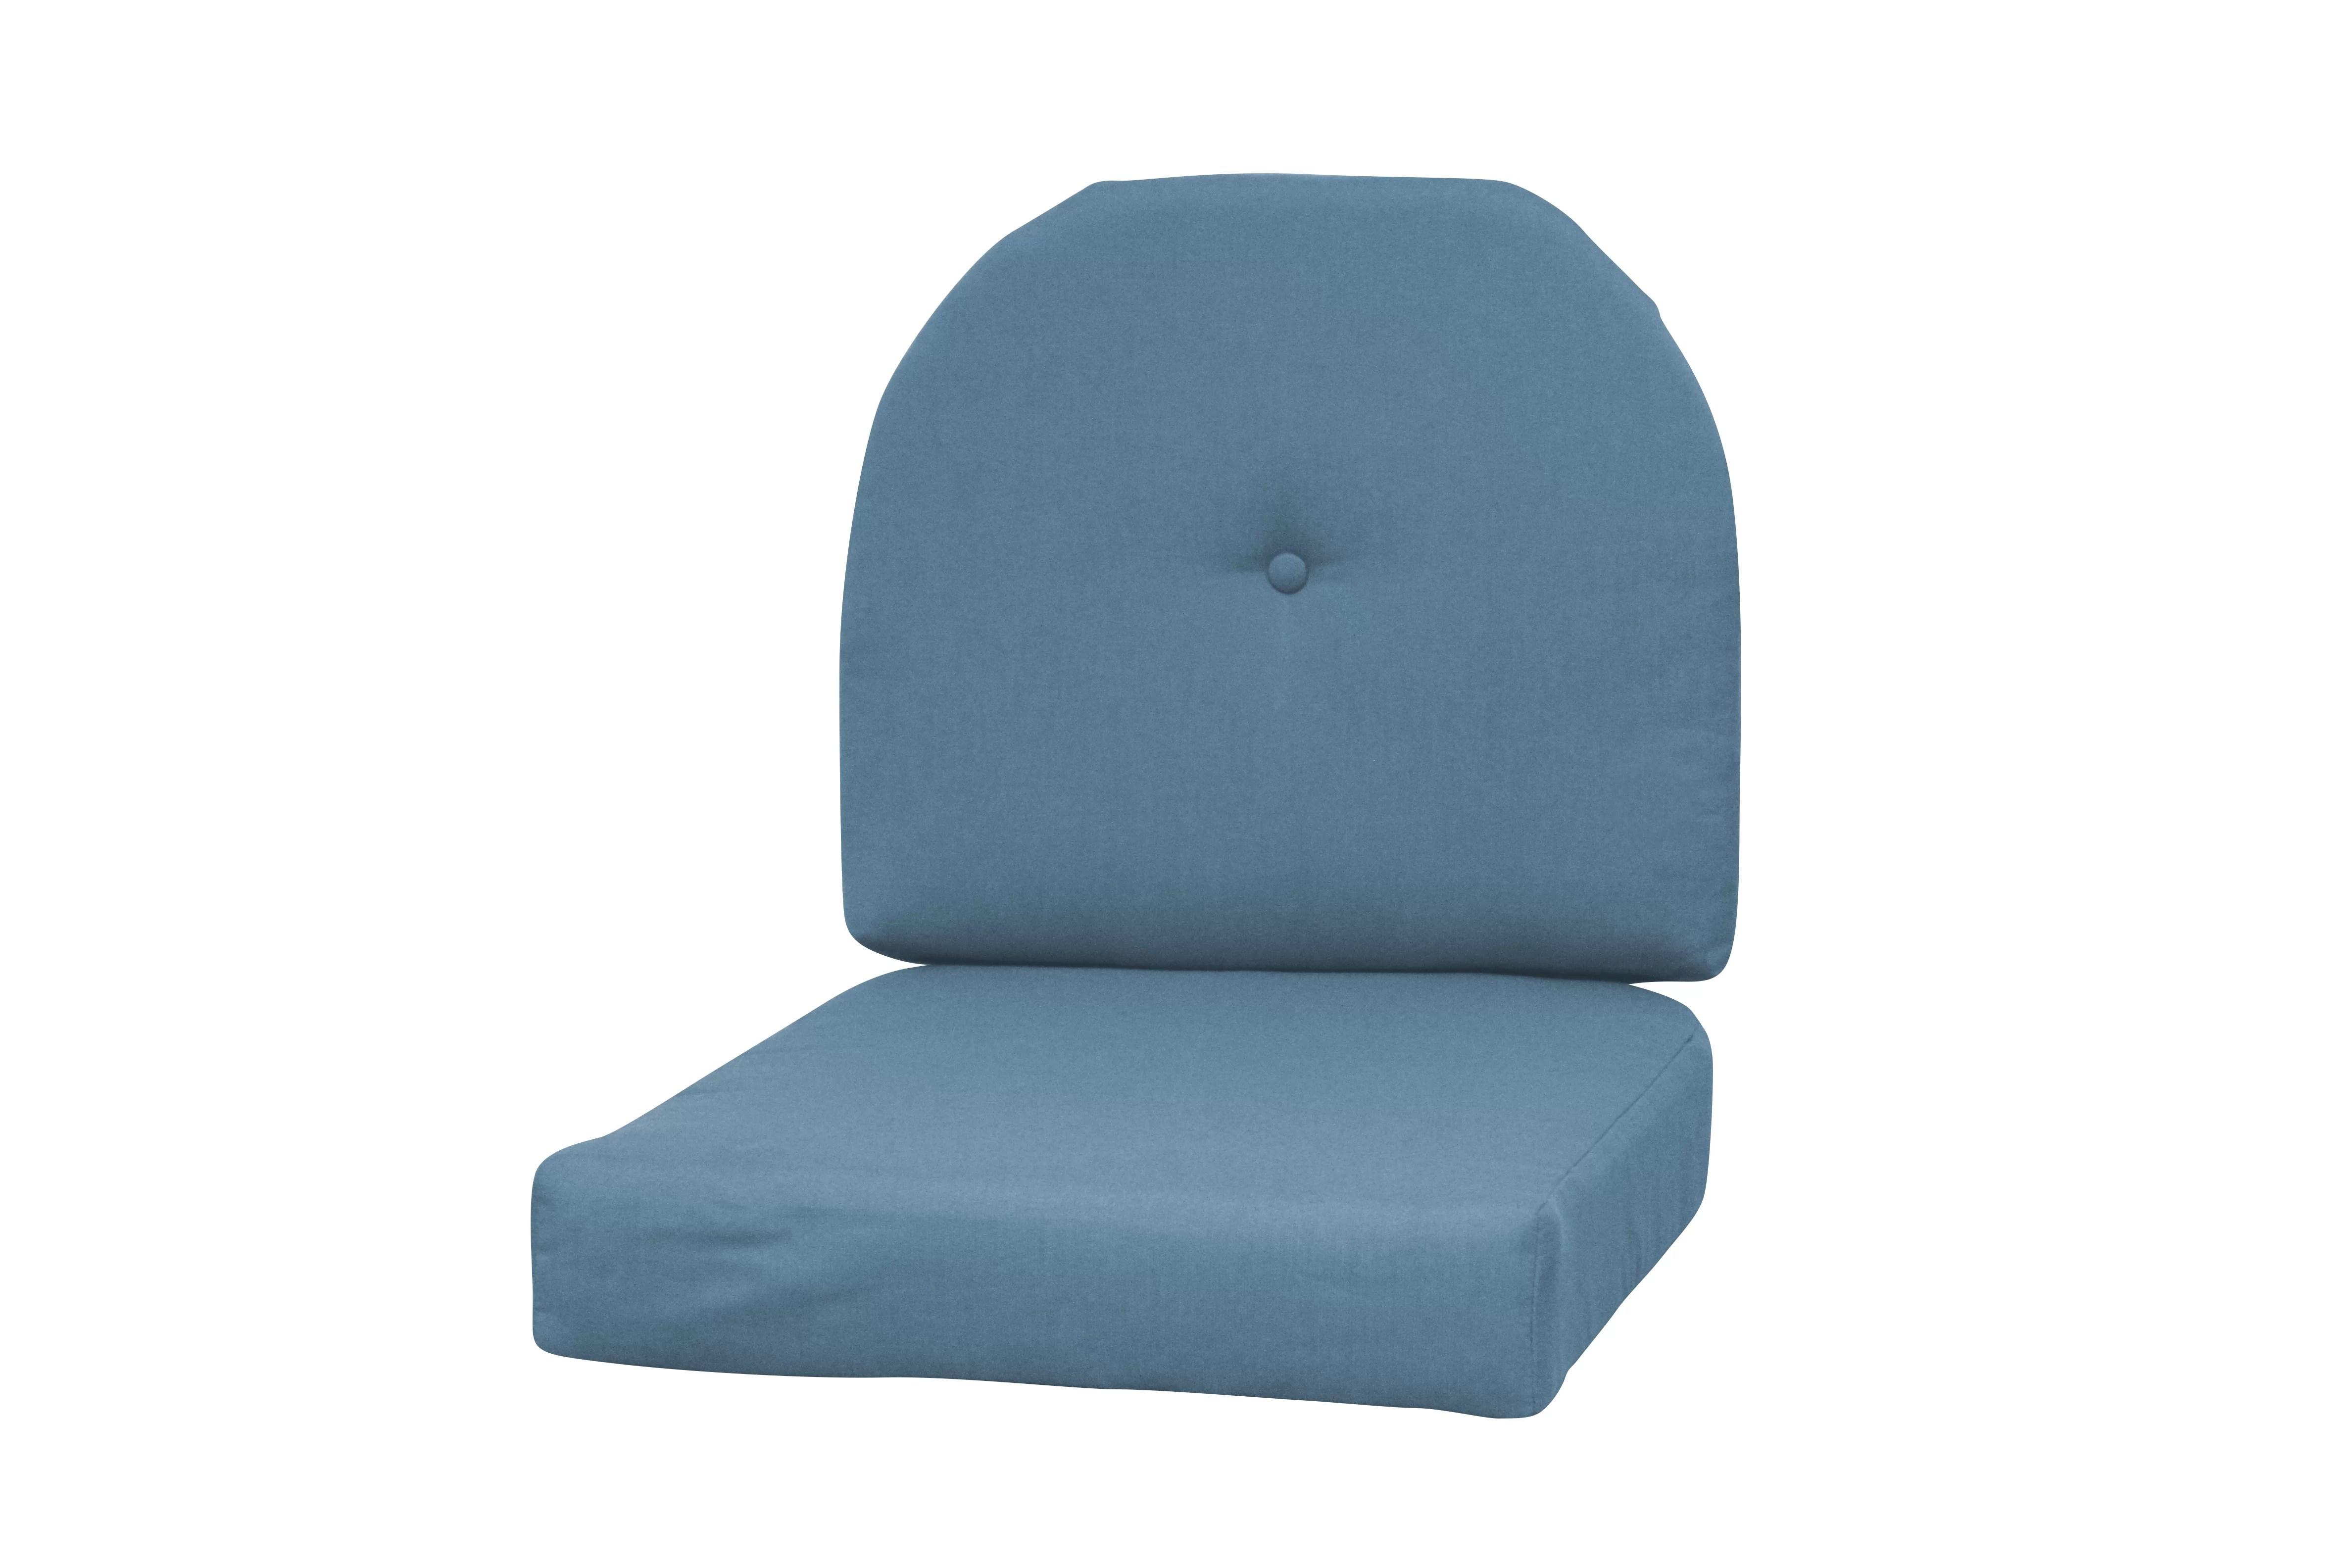 Wicker Indoor Outdoor Sunbrella Rocking Chair Cushion